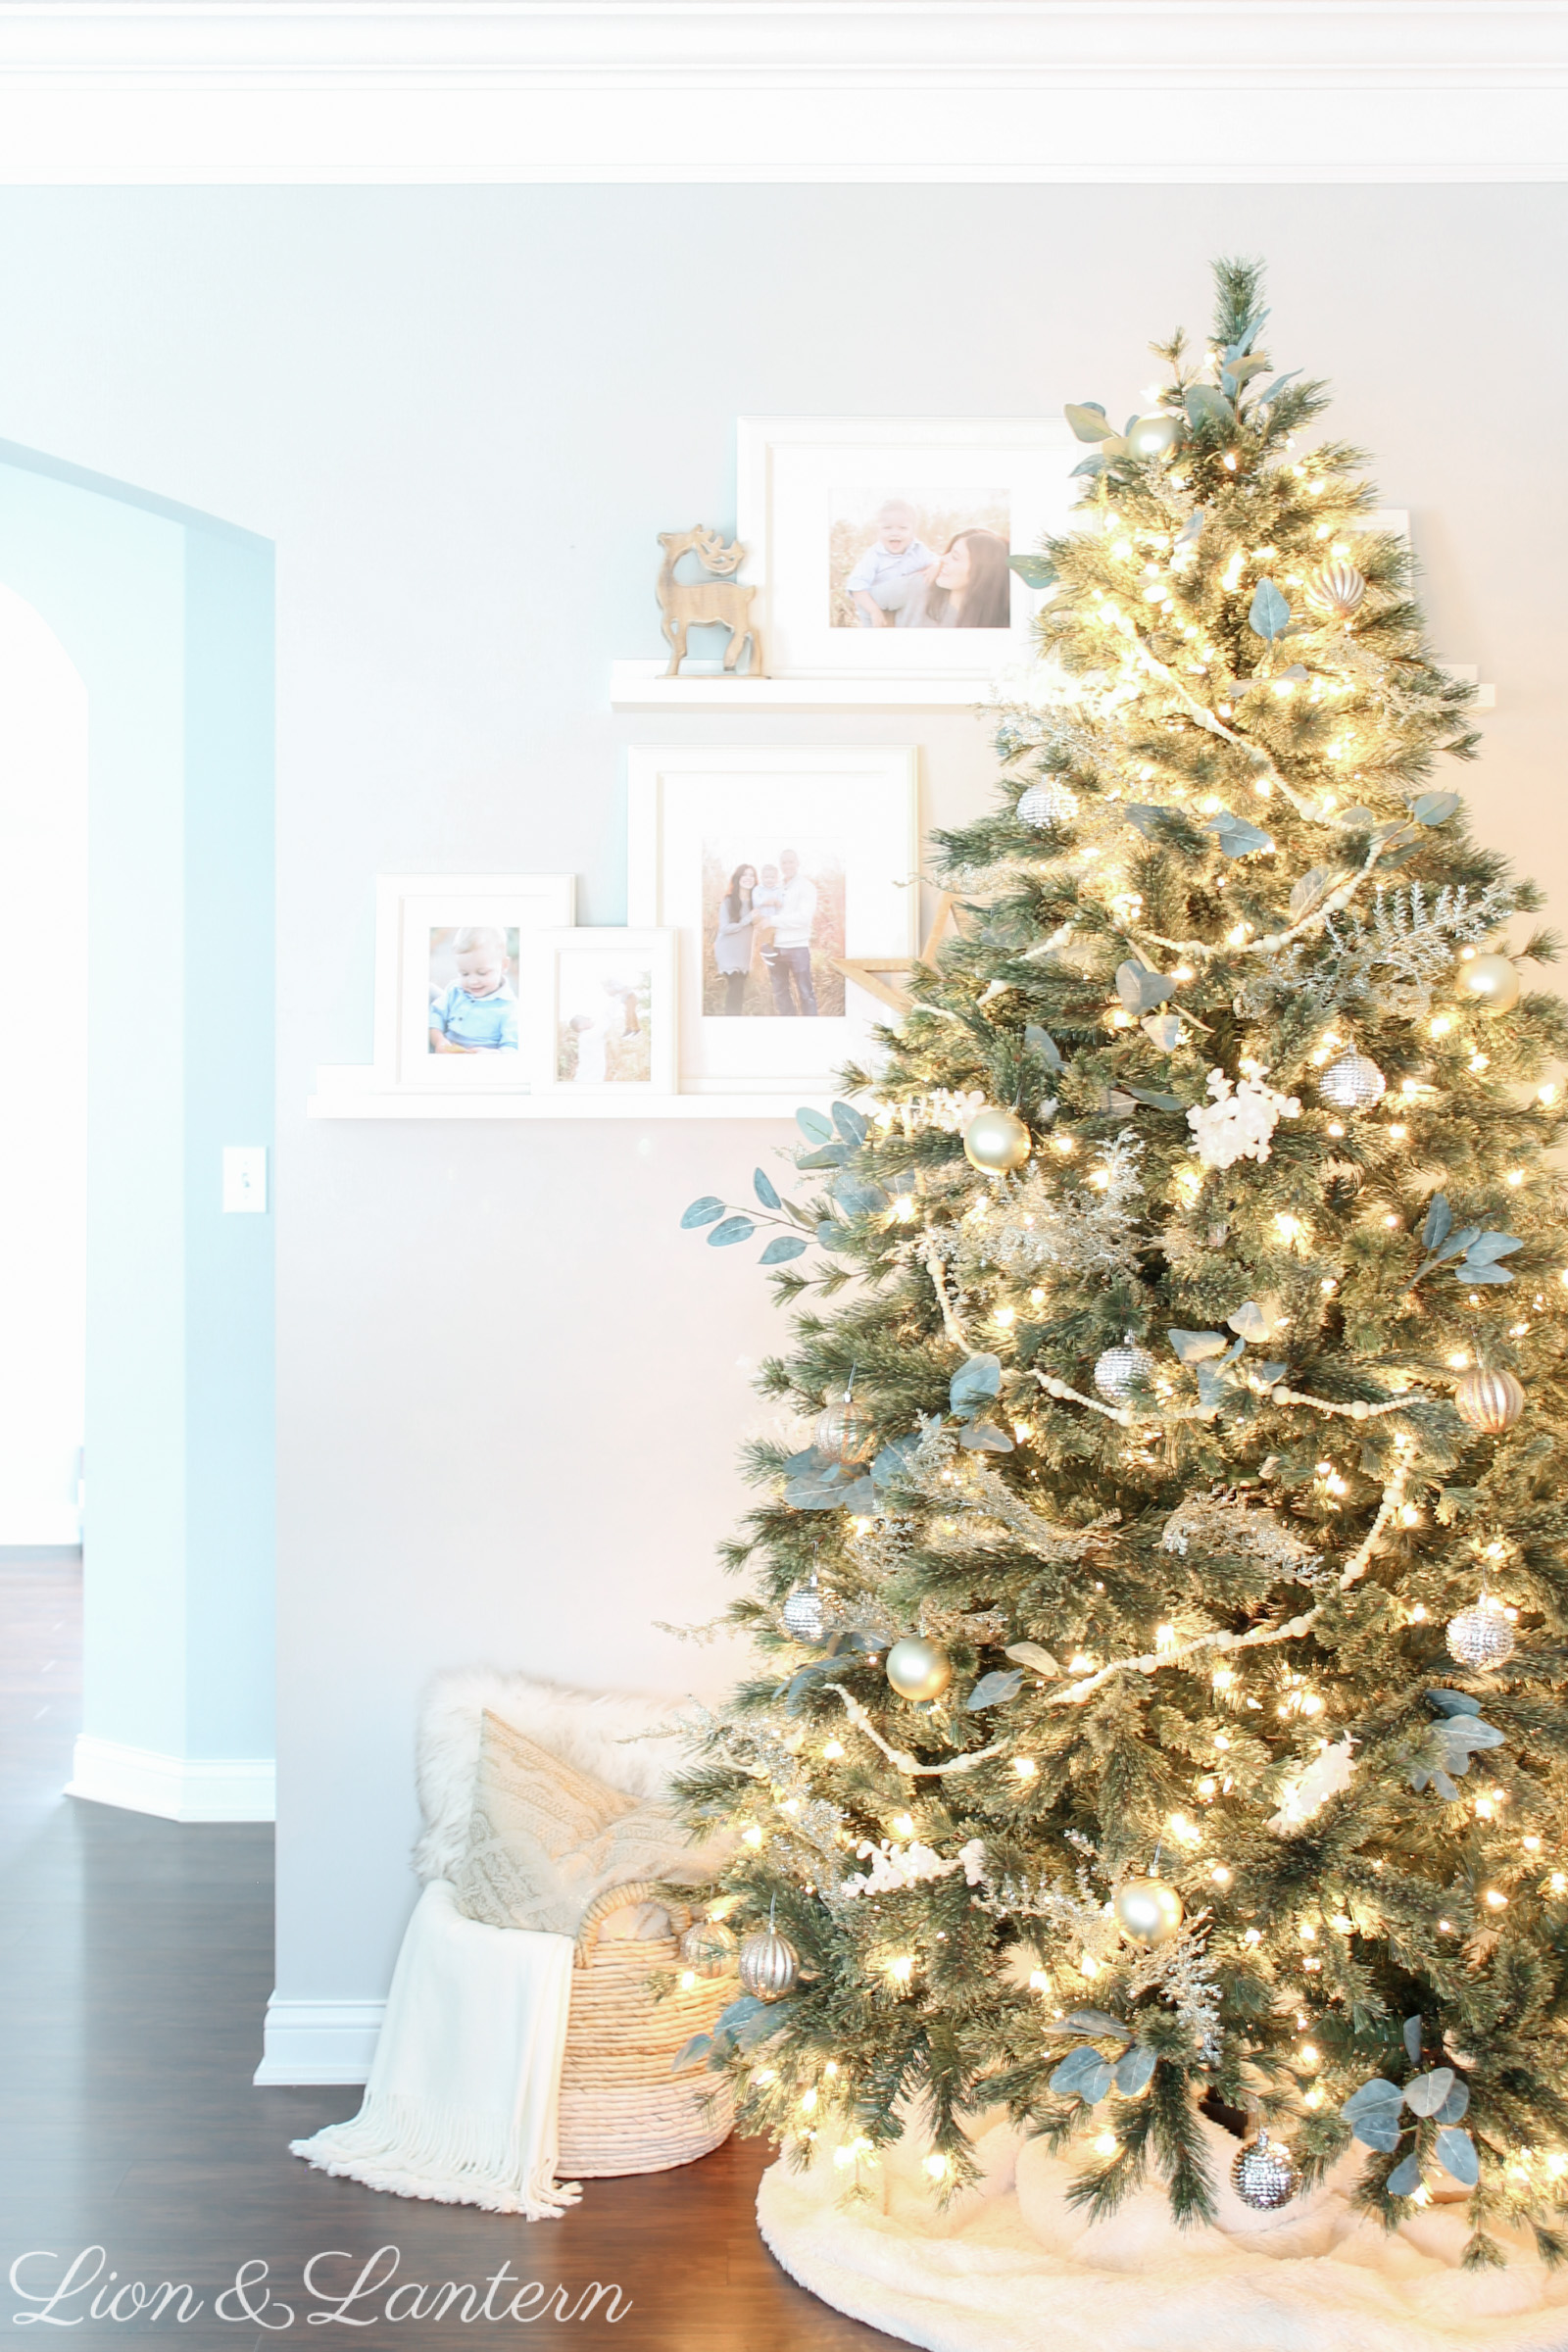 Modern Metallic Christmas Tree at LionAndLantern.com | minimalist Christmas, Scandi, bead garland, eucalyptus, cashmere tree, modern Christmas decor